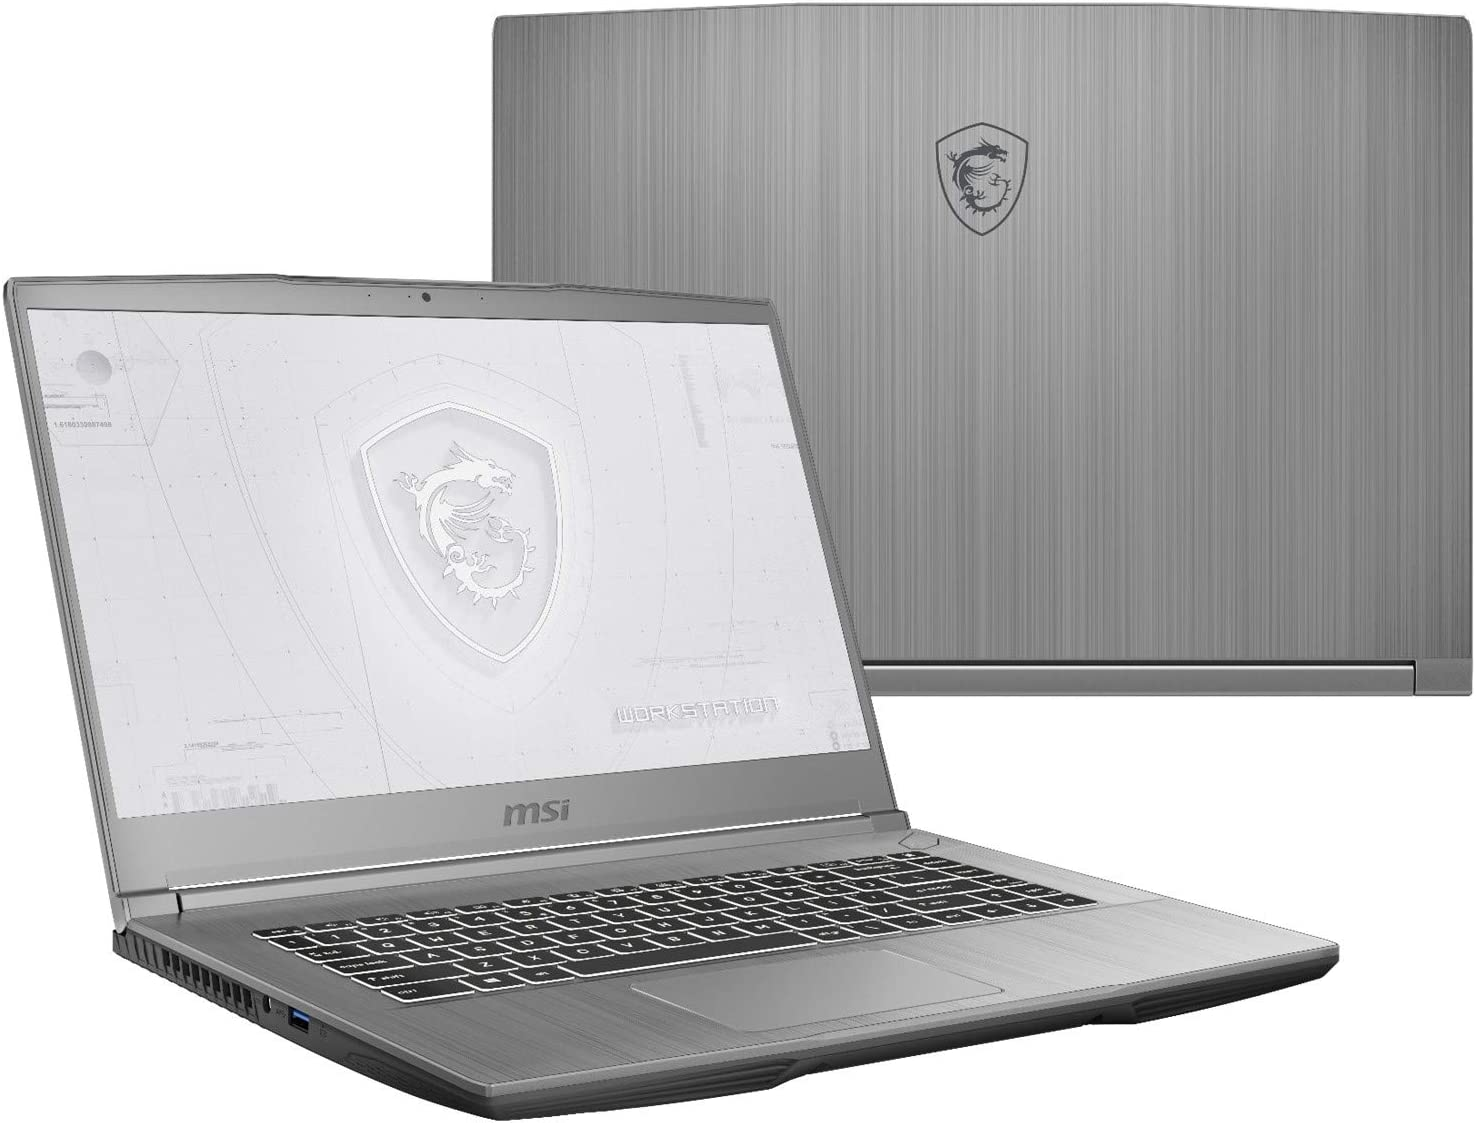 "MSI WF65 10TH-1201 (i7-10750H, 64GB RAM, 512GB NVMe SSD, Quadro P620 4GB, 15.6"" Full HD, Windows 10 Pro) Workstation Laptop"